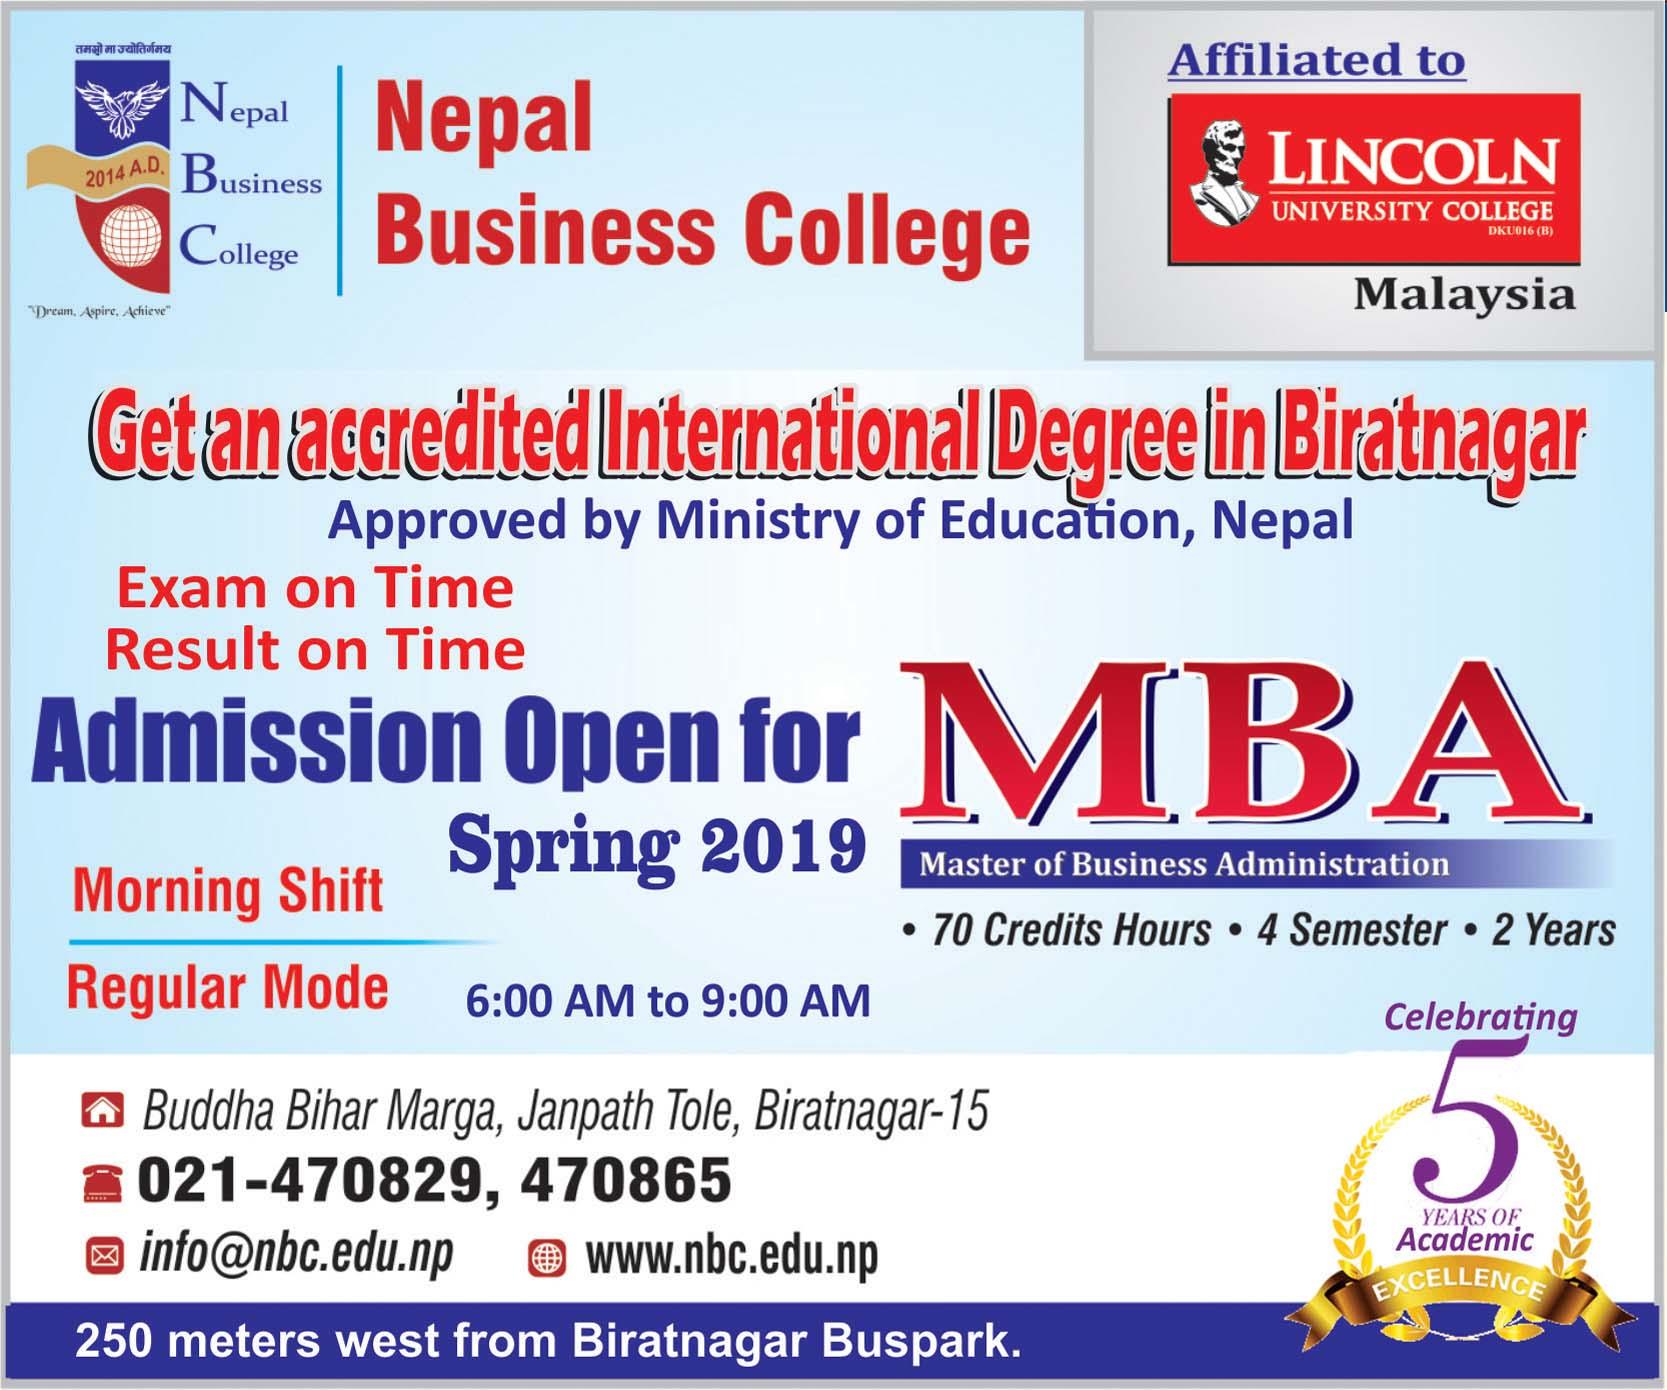 nepal Bisiness College